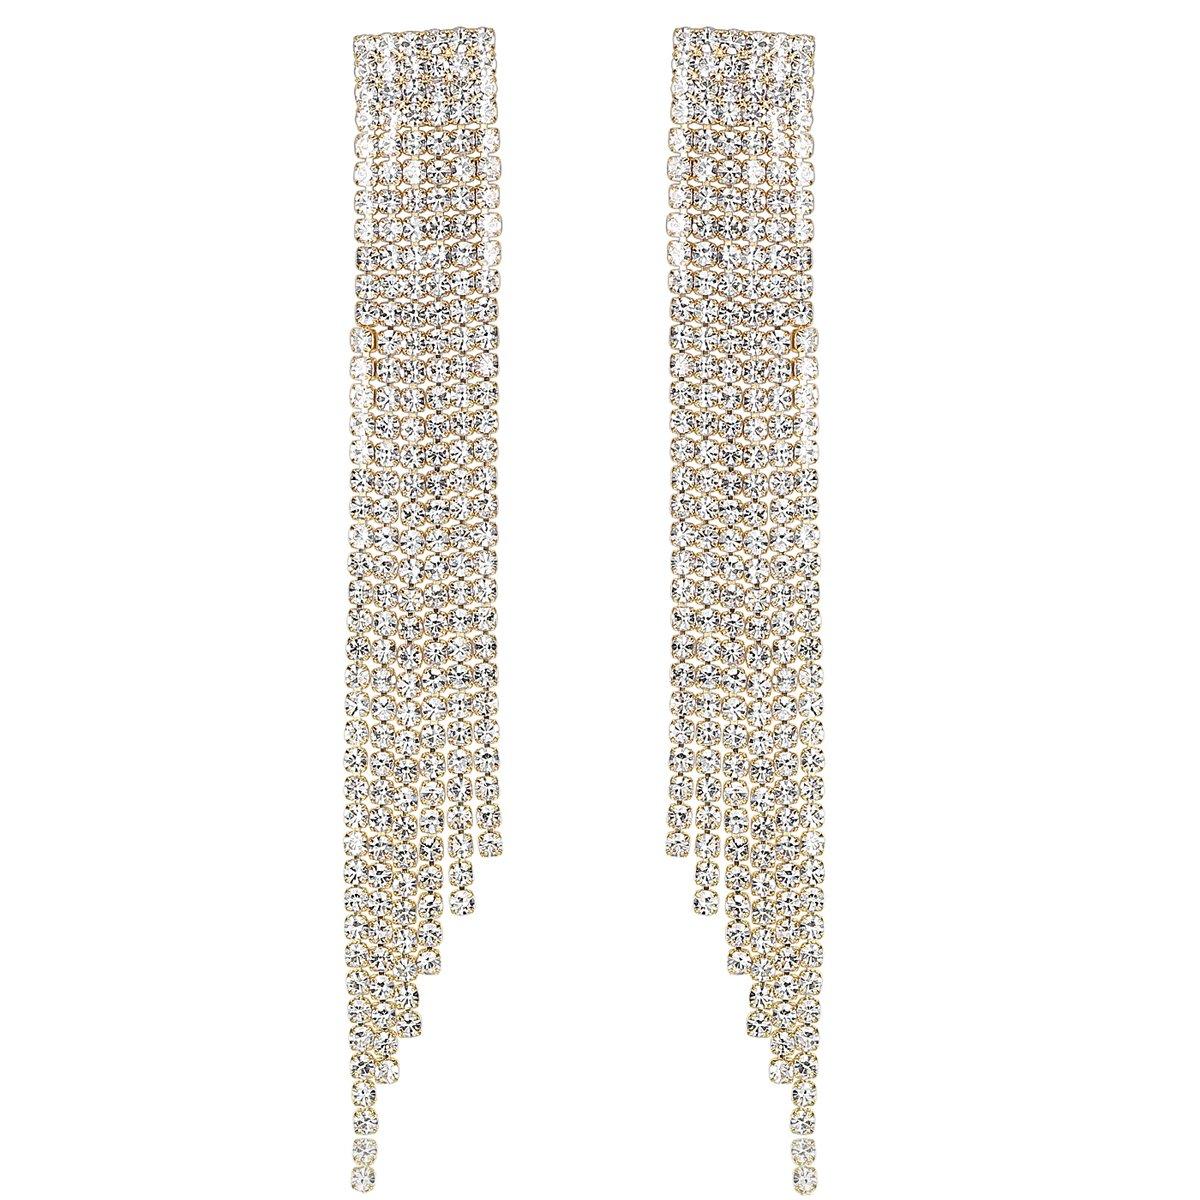 mecresh Gold Bridal Crystal Long Tassel Wedding Earrings for women brides bridesmaid